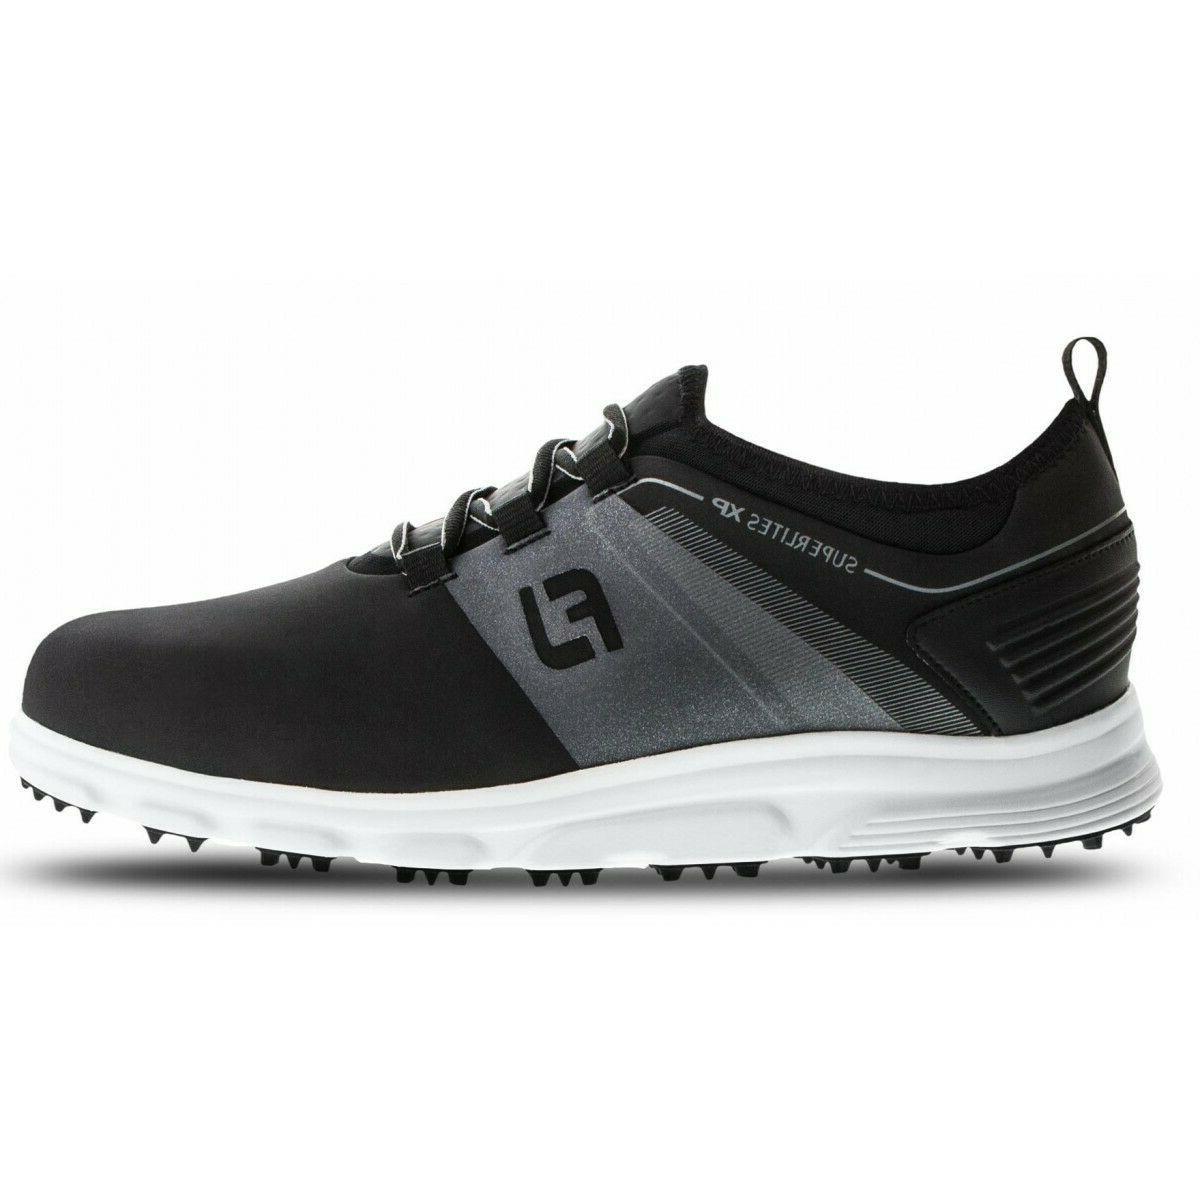 New SuperLites Golf Shoes Size & Lite XP